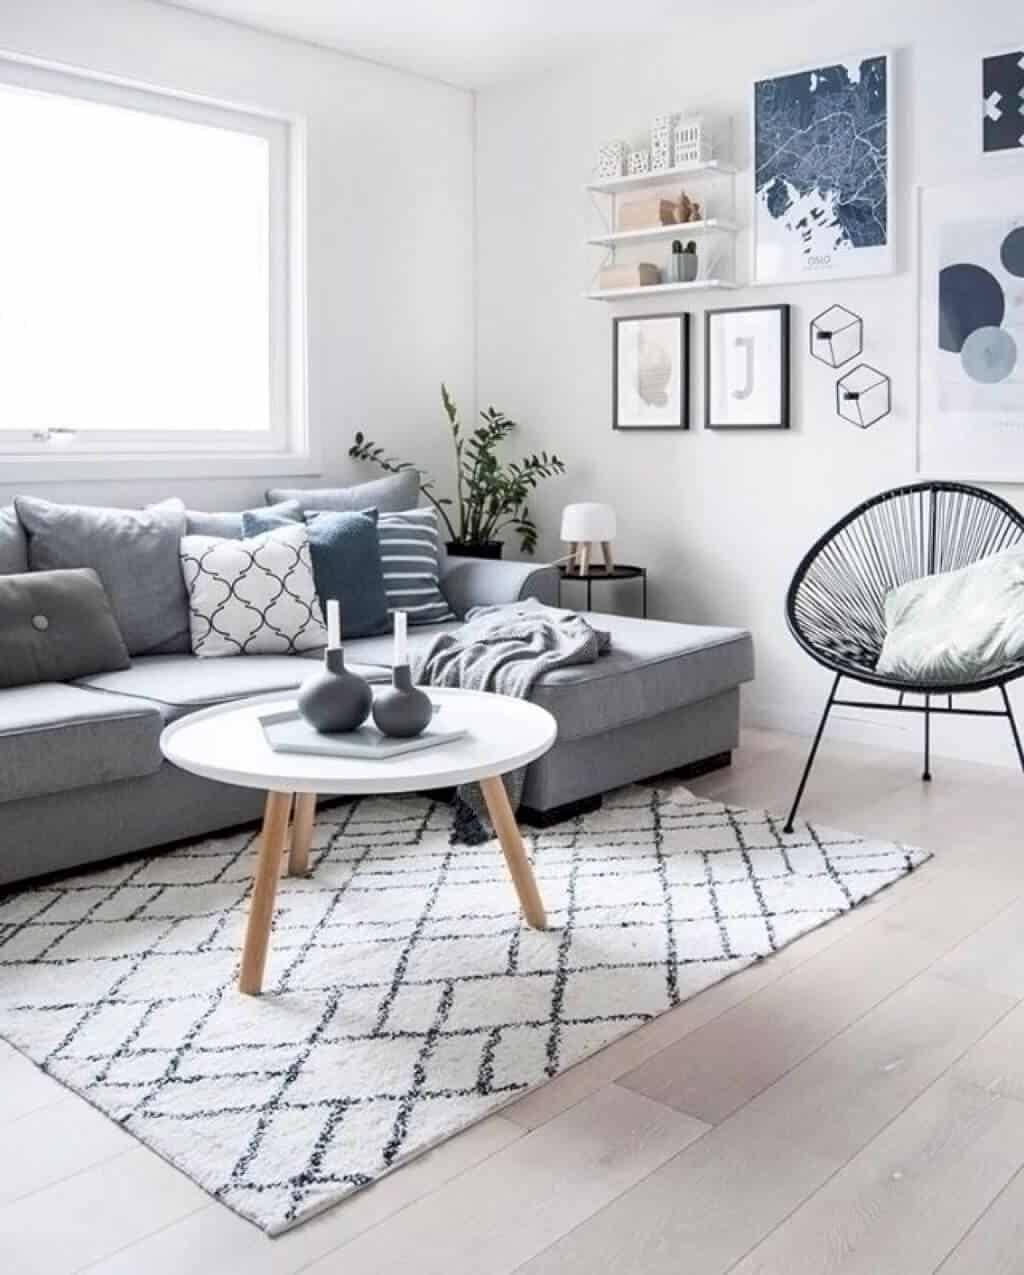 19 Most Mesmerizing Ideas Of Scandinavian Living Room